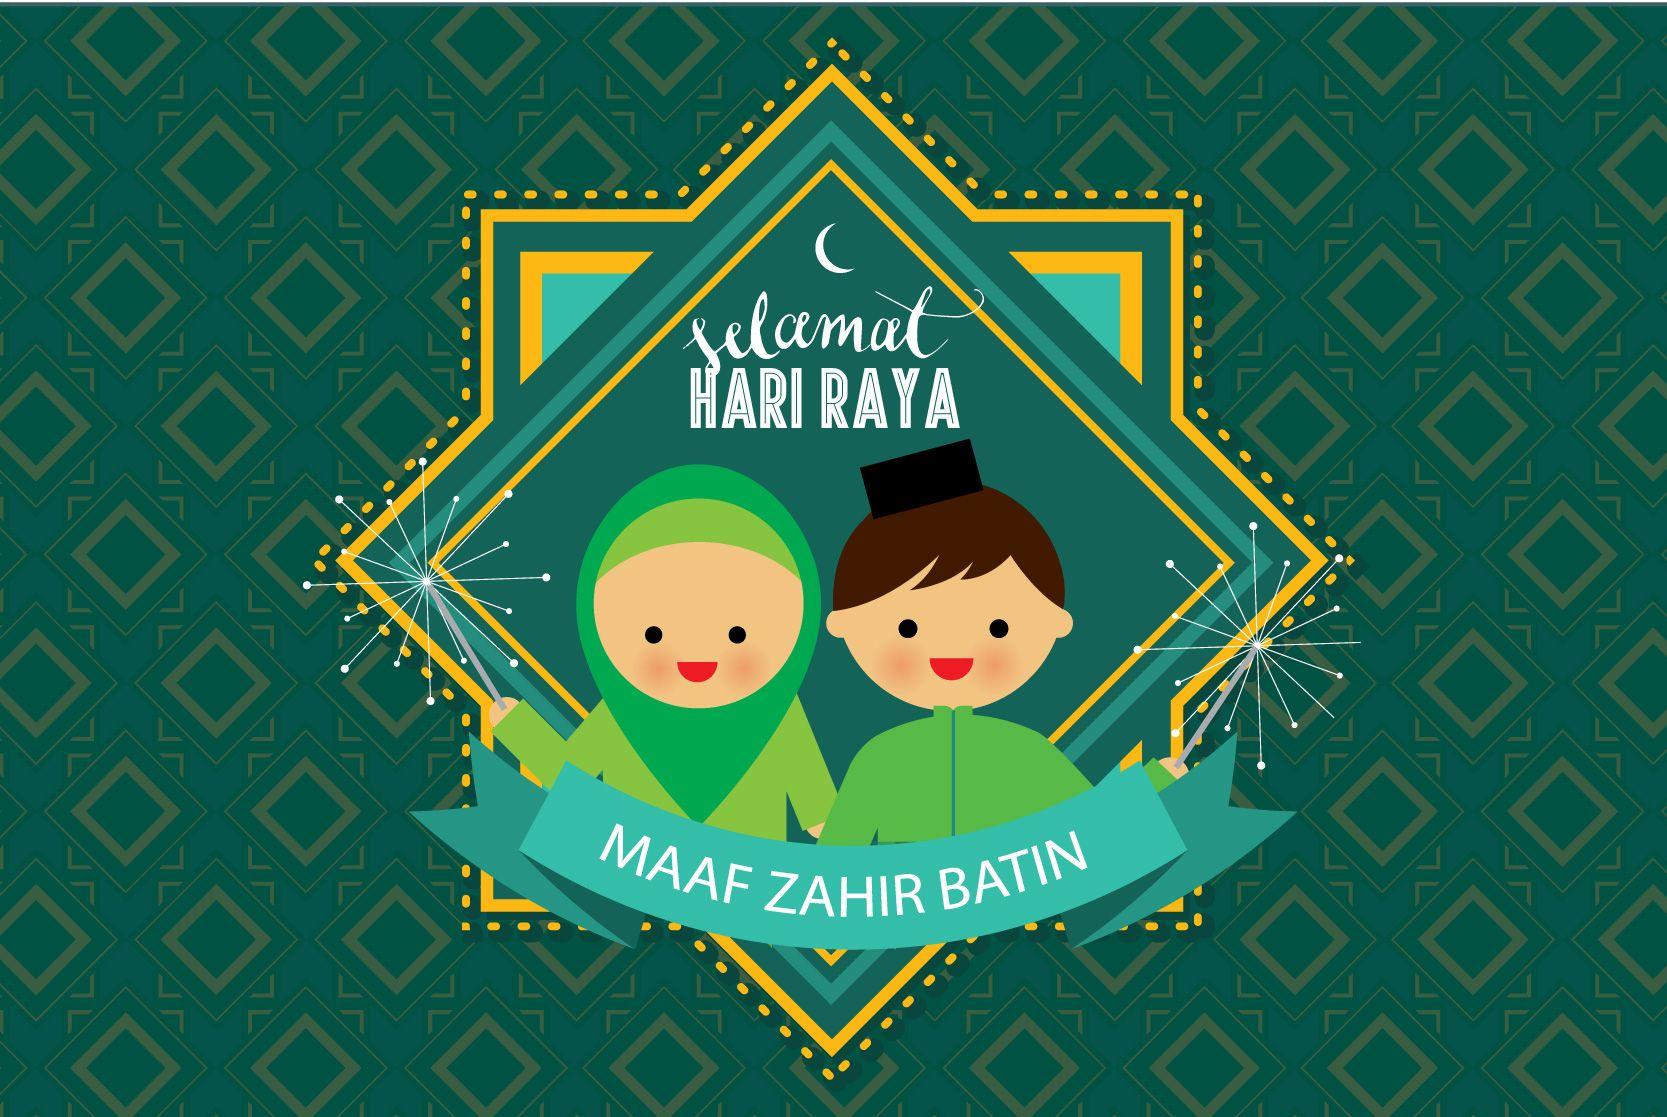 Hari raya greeting vector by lyeyee on creativemarket hari raya greeting vector by lyeyee on creativemarket kristyandbryce Image collections